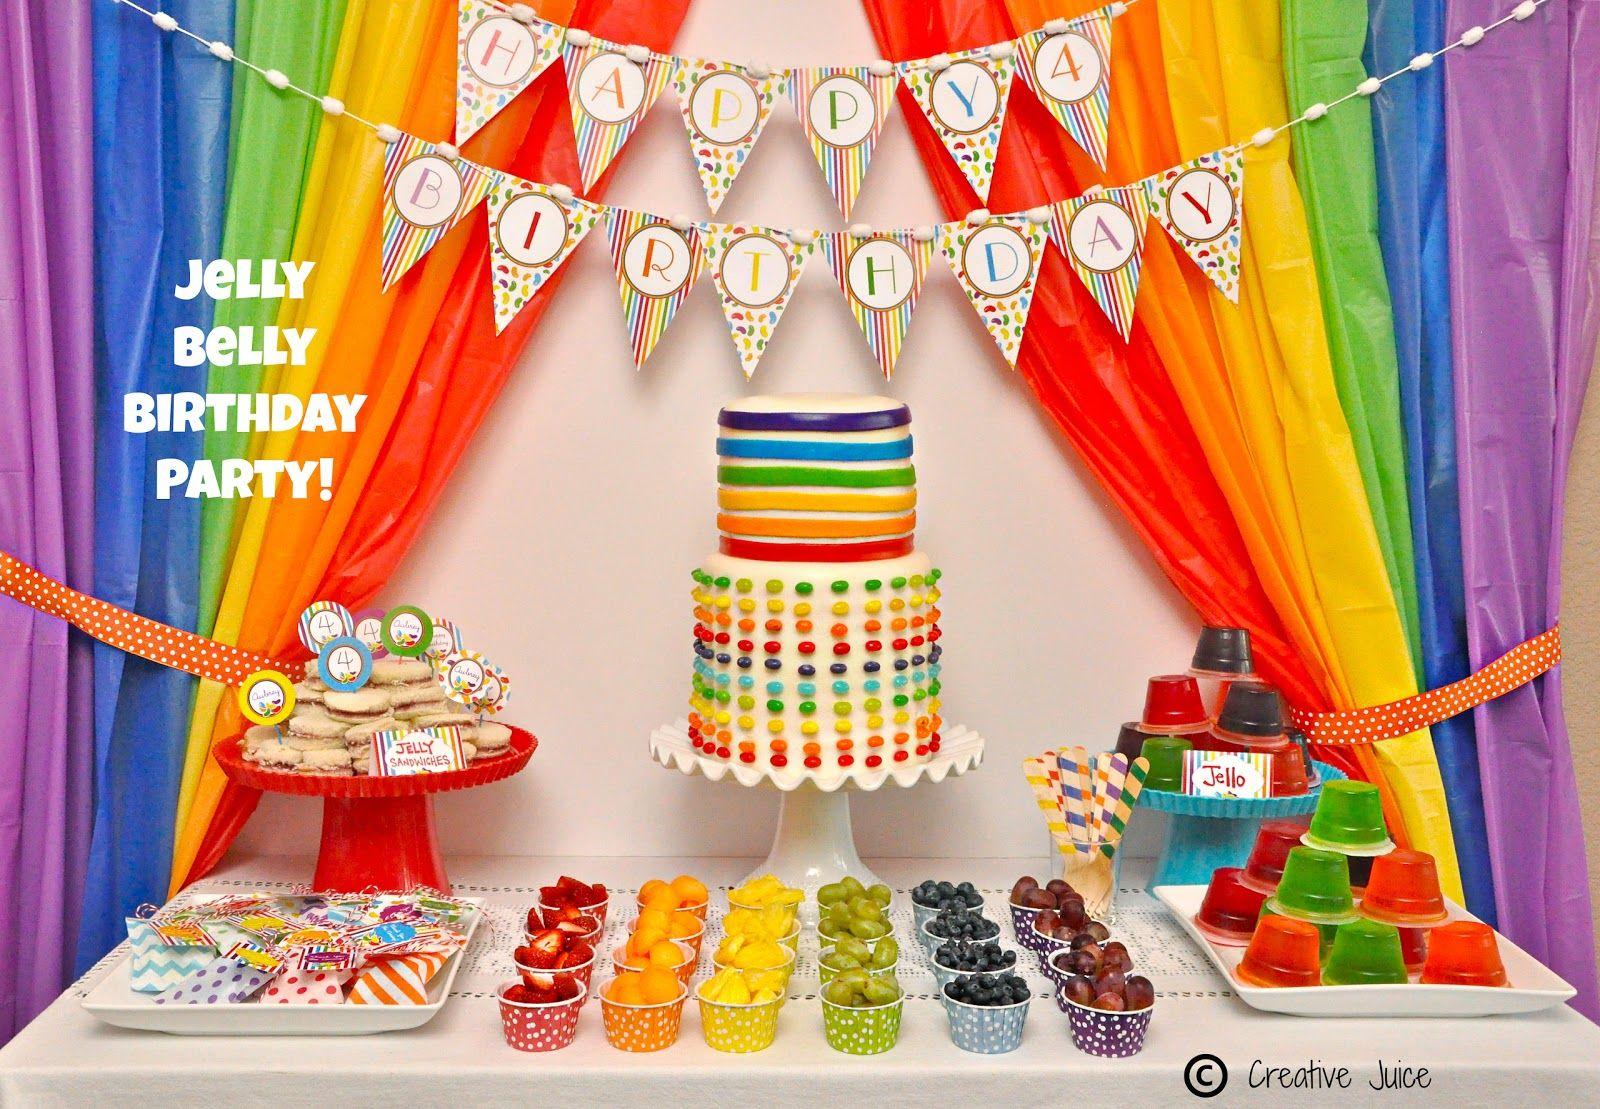 4.bp.blogspot.com -ZVLn1GkalbM USK2Fu581SI AAAAAAAADwA ierm9K5MMmY s1600 jelly+bean+birthday+party+rainbow+party+1.jpg